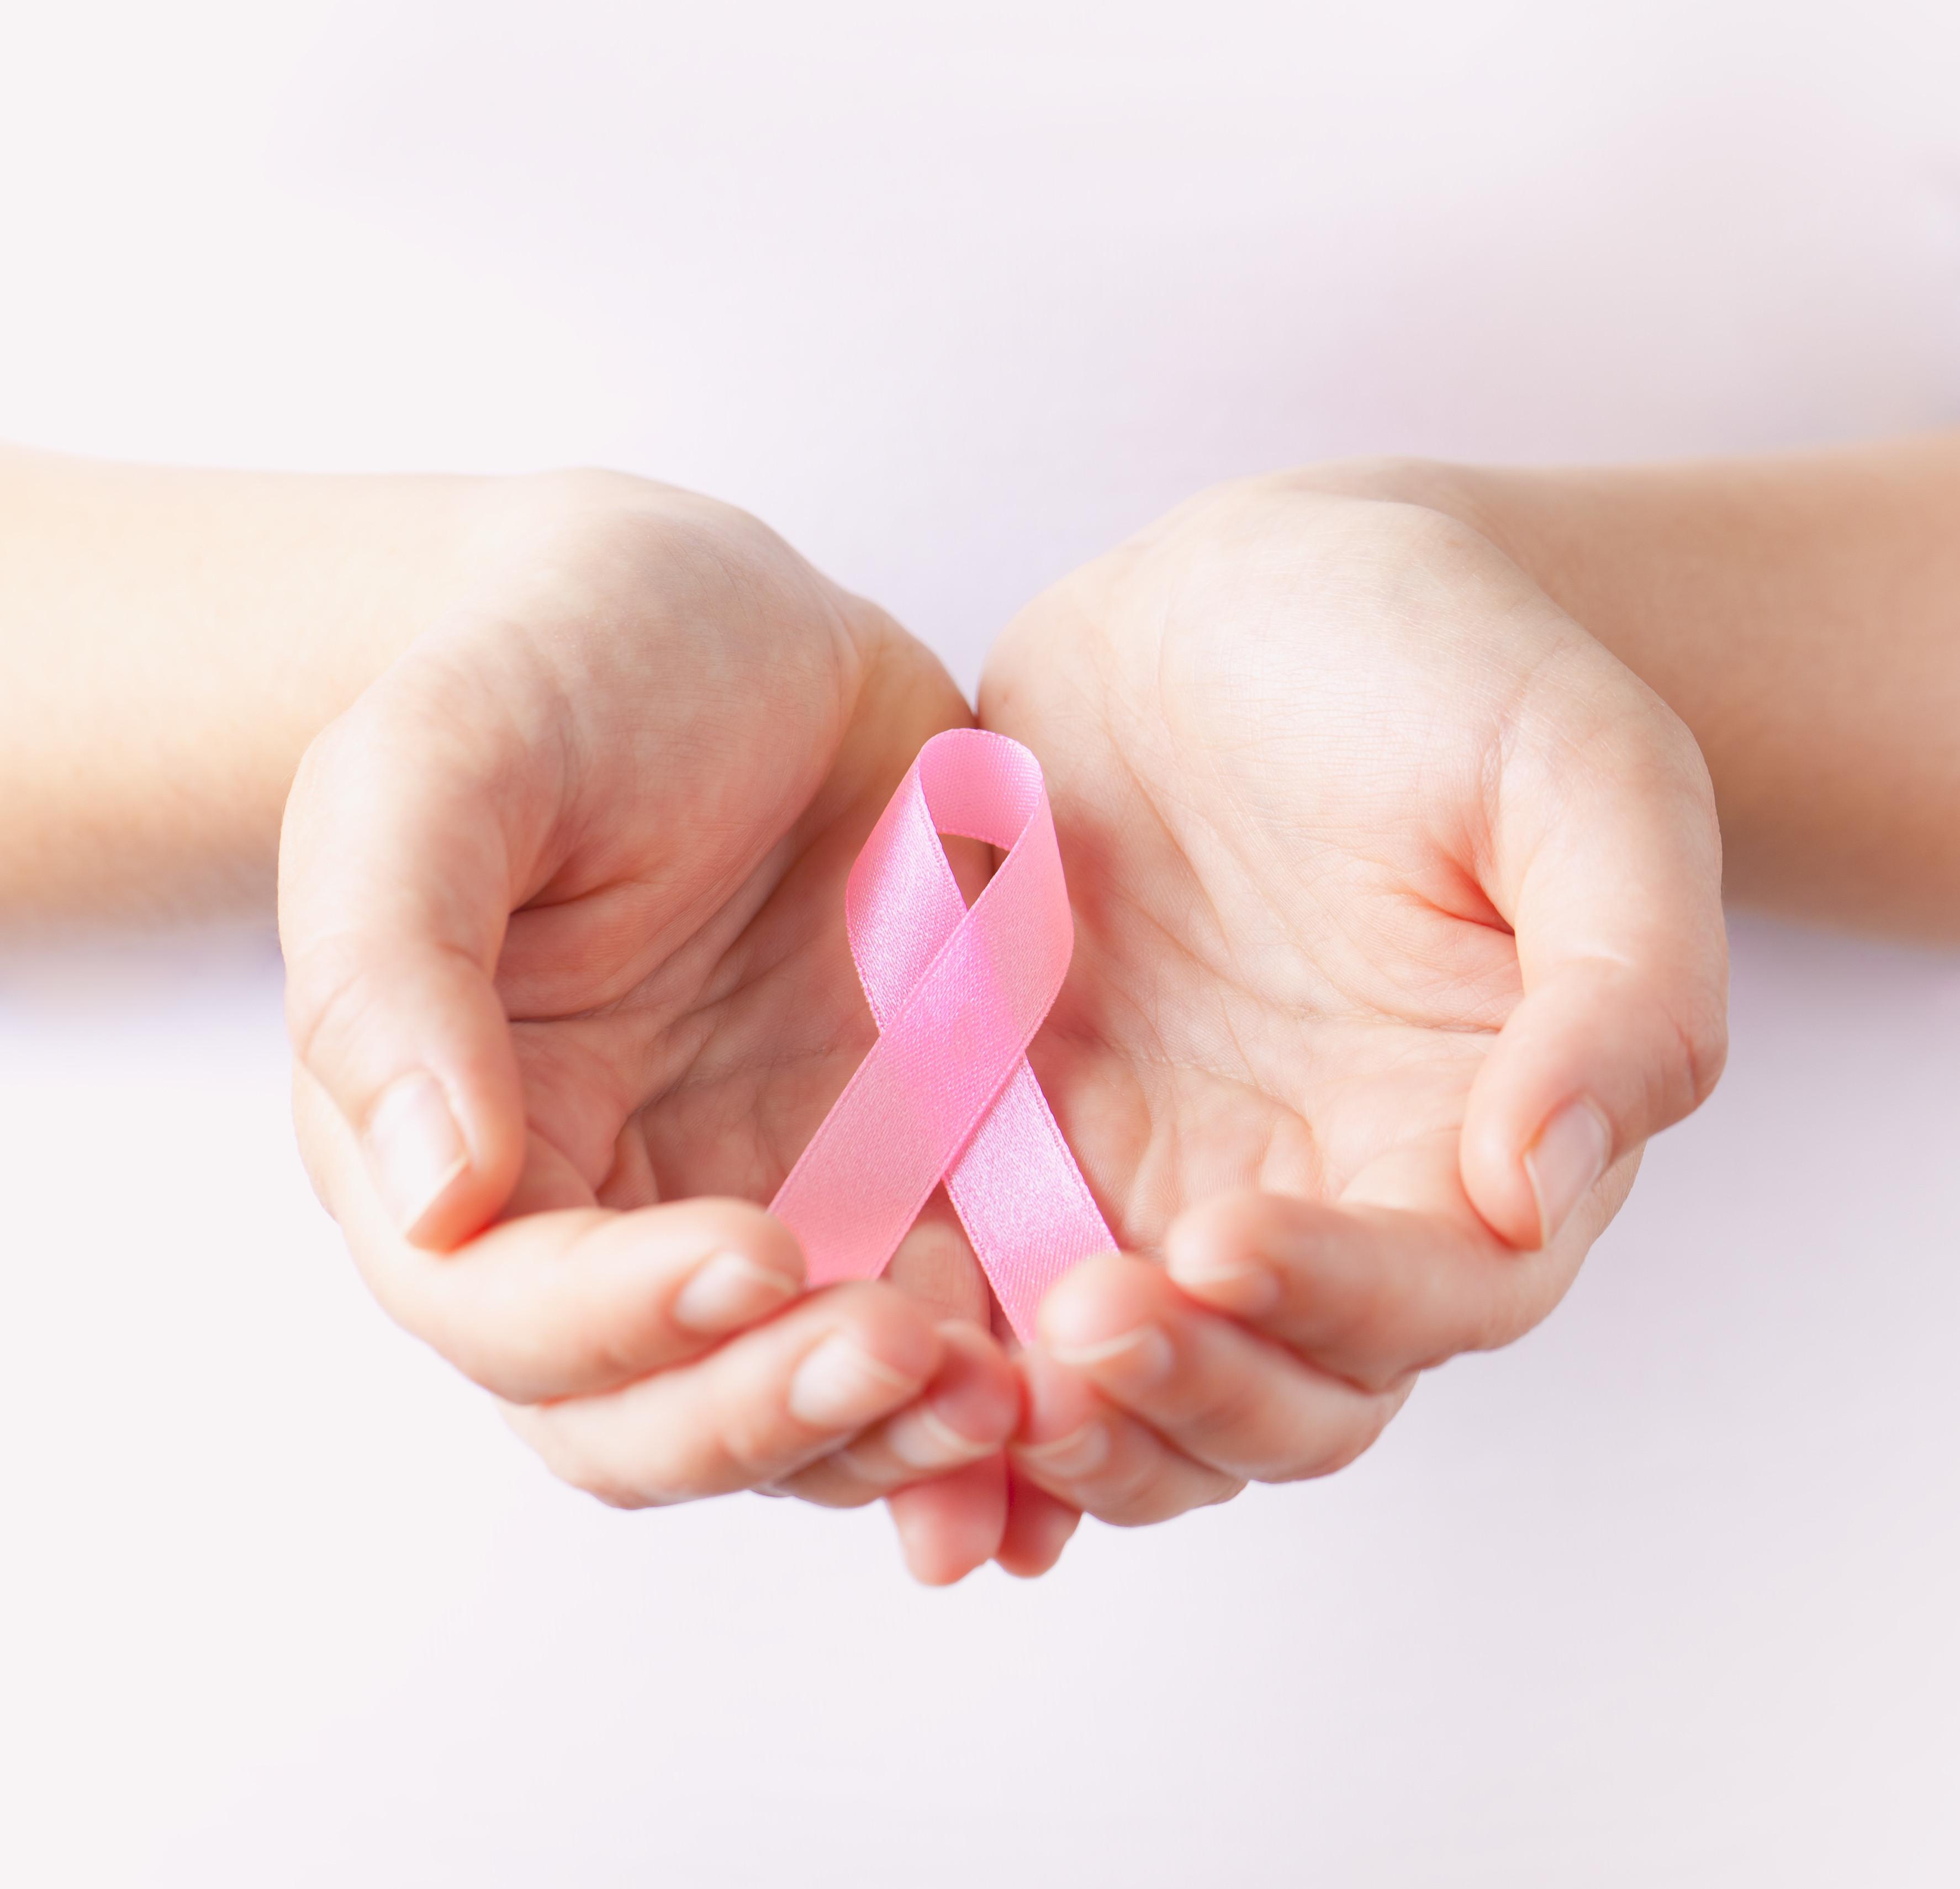 female cancer